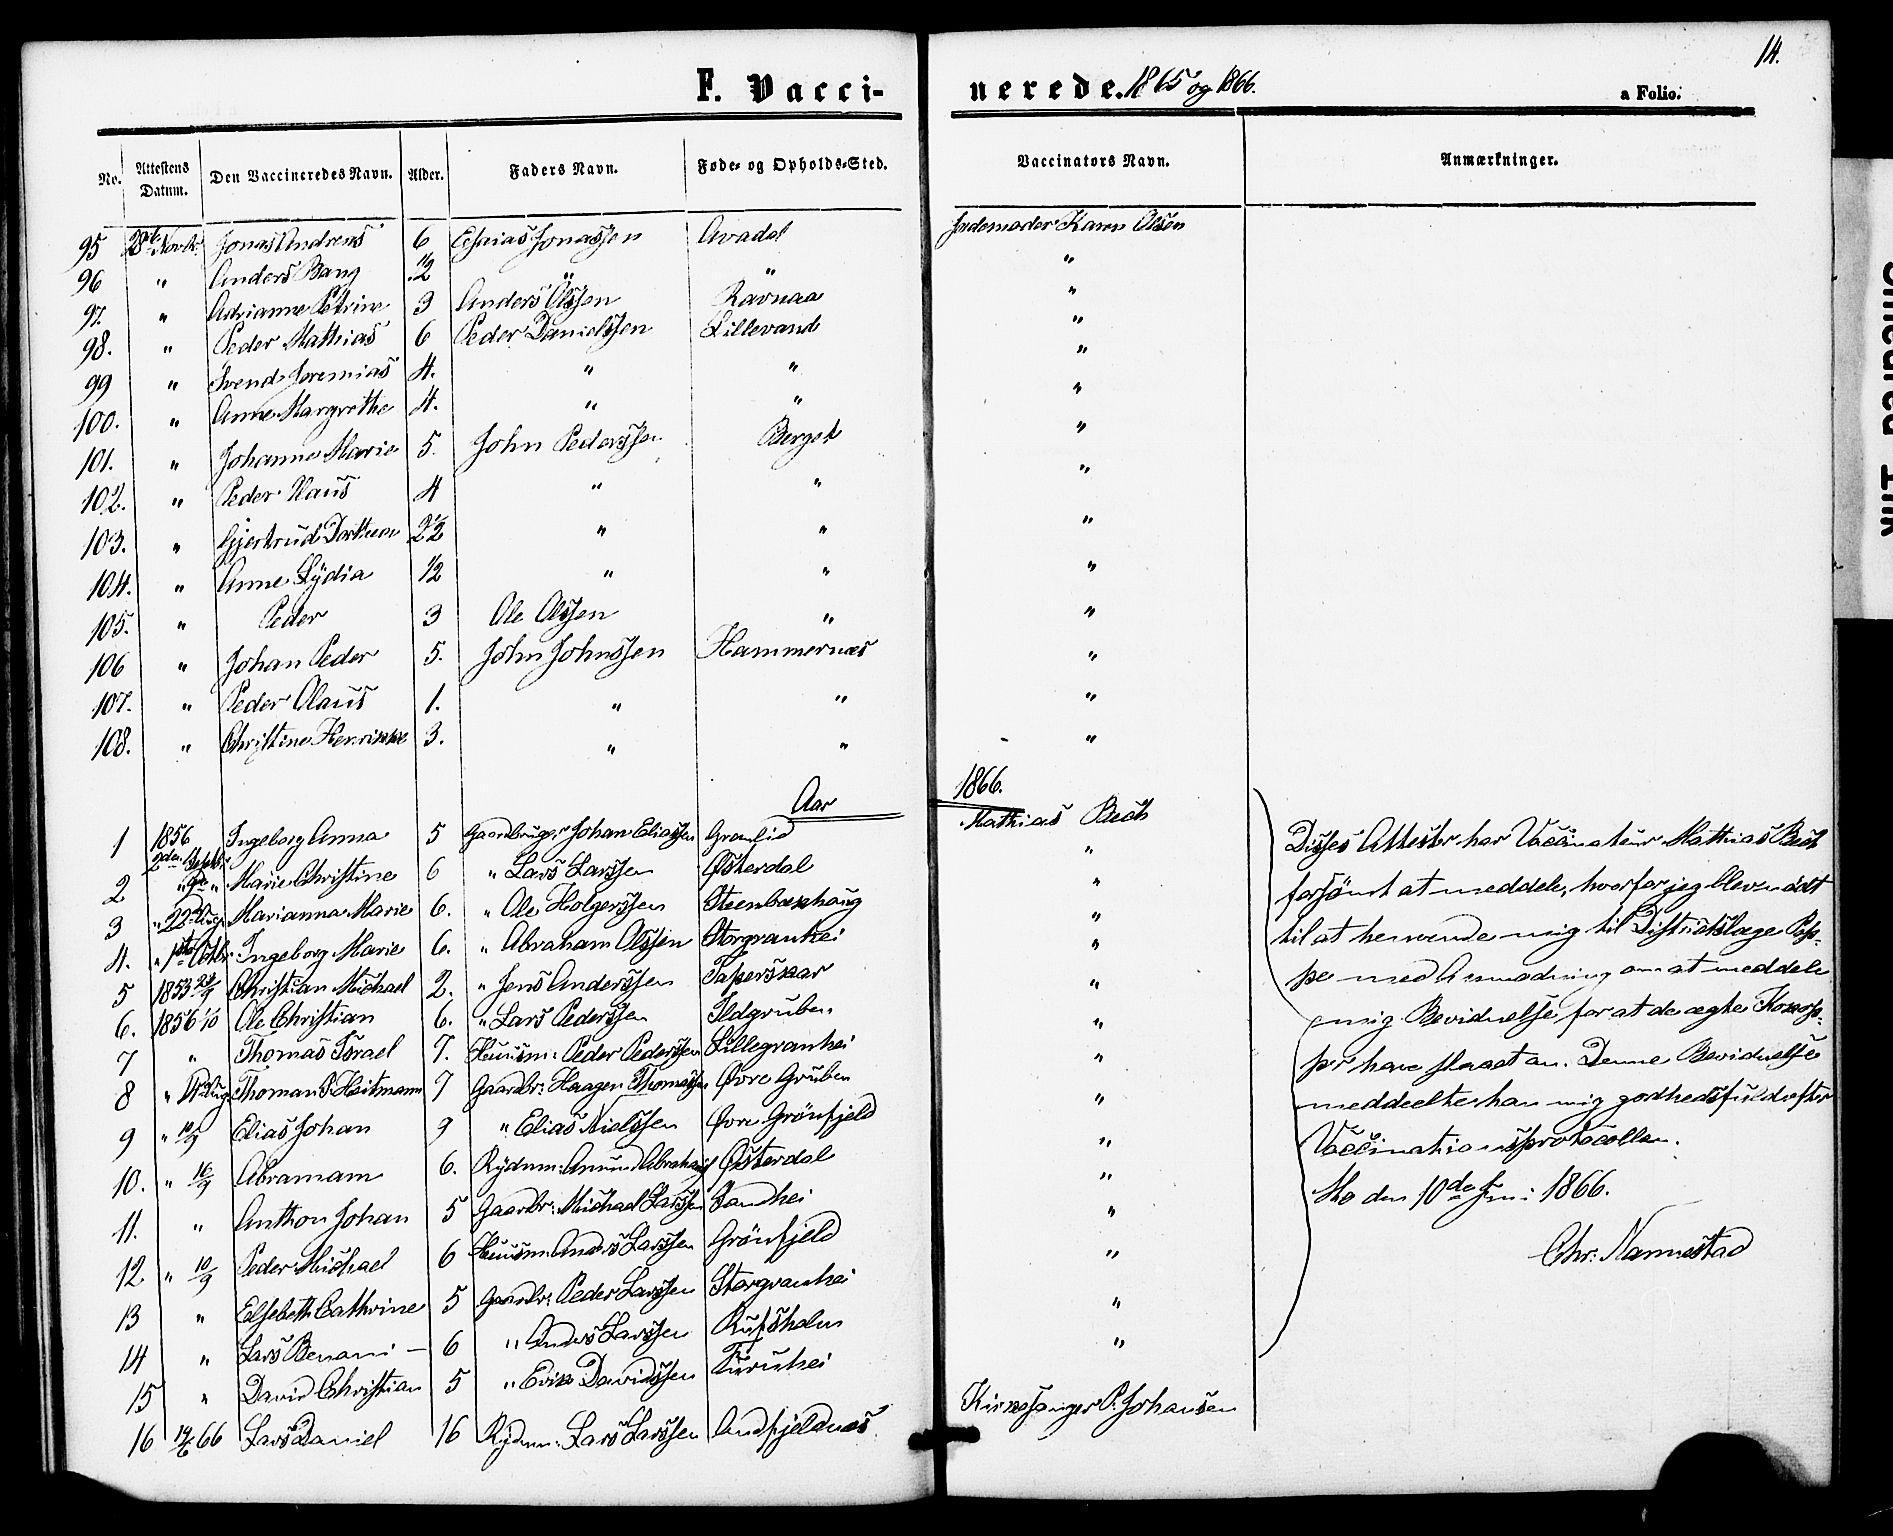 SAT, Ministerialprotokoller, klokkerbøker og fødselsregistre - Nordland, 827/L0397: Ministerialbok nr. 827A09, 1862-1876, s. 14